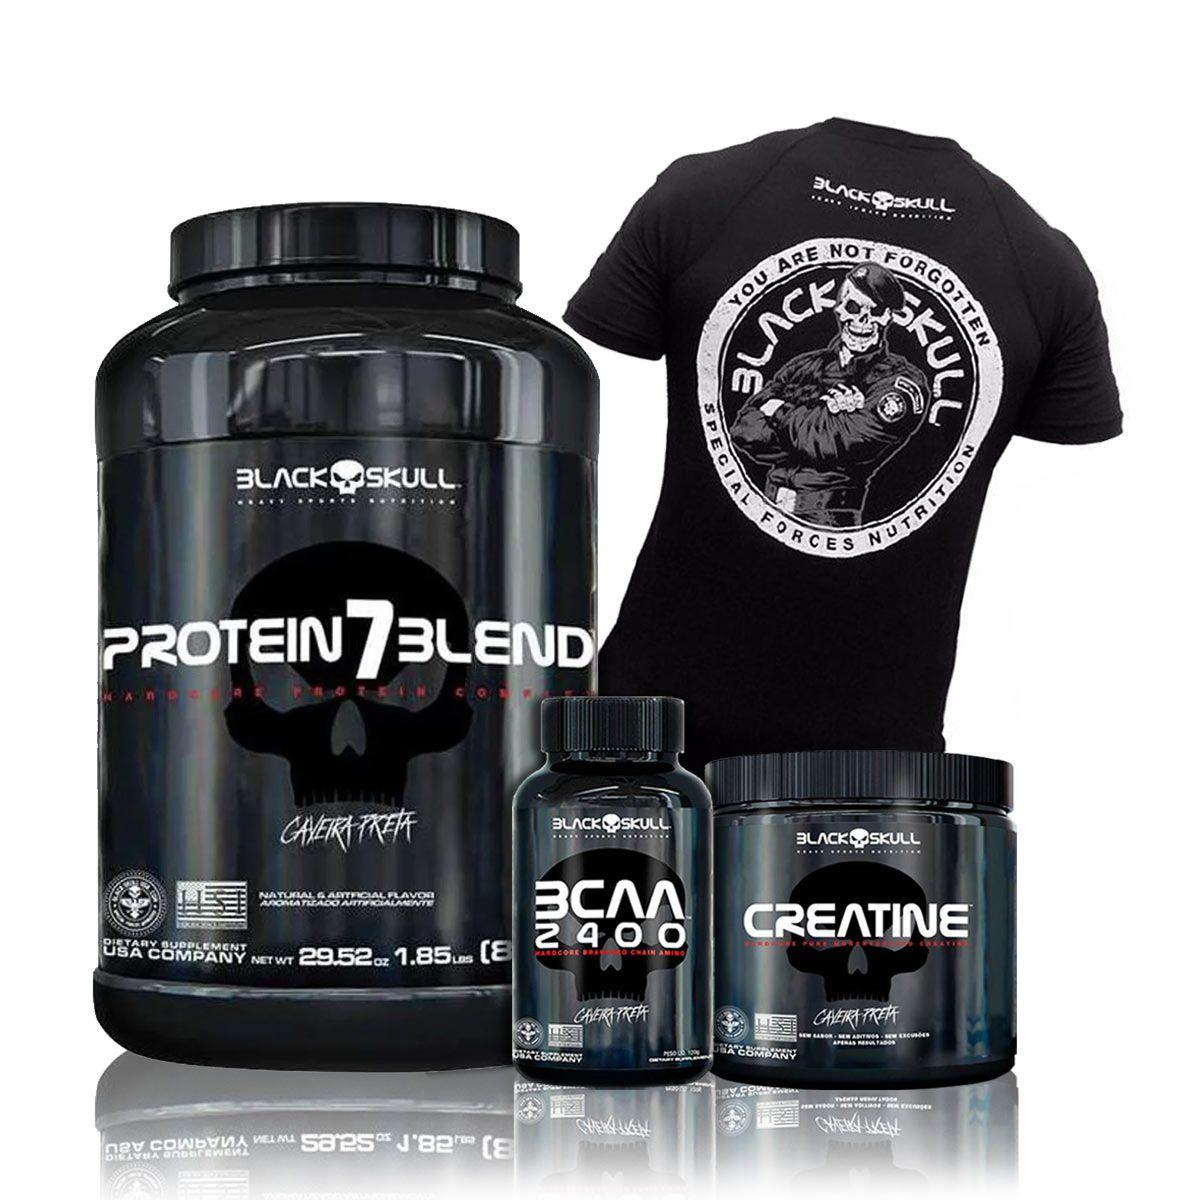 Kit Ganho de Massa Muscular - Protein 7 Blend + BCAA + Creatina + Camiseta - Black Skull